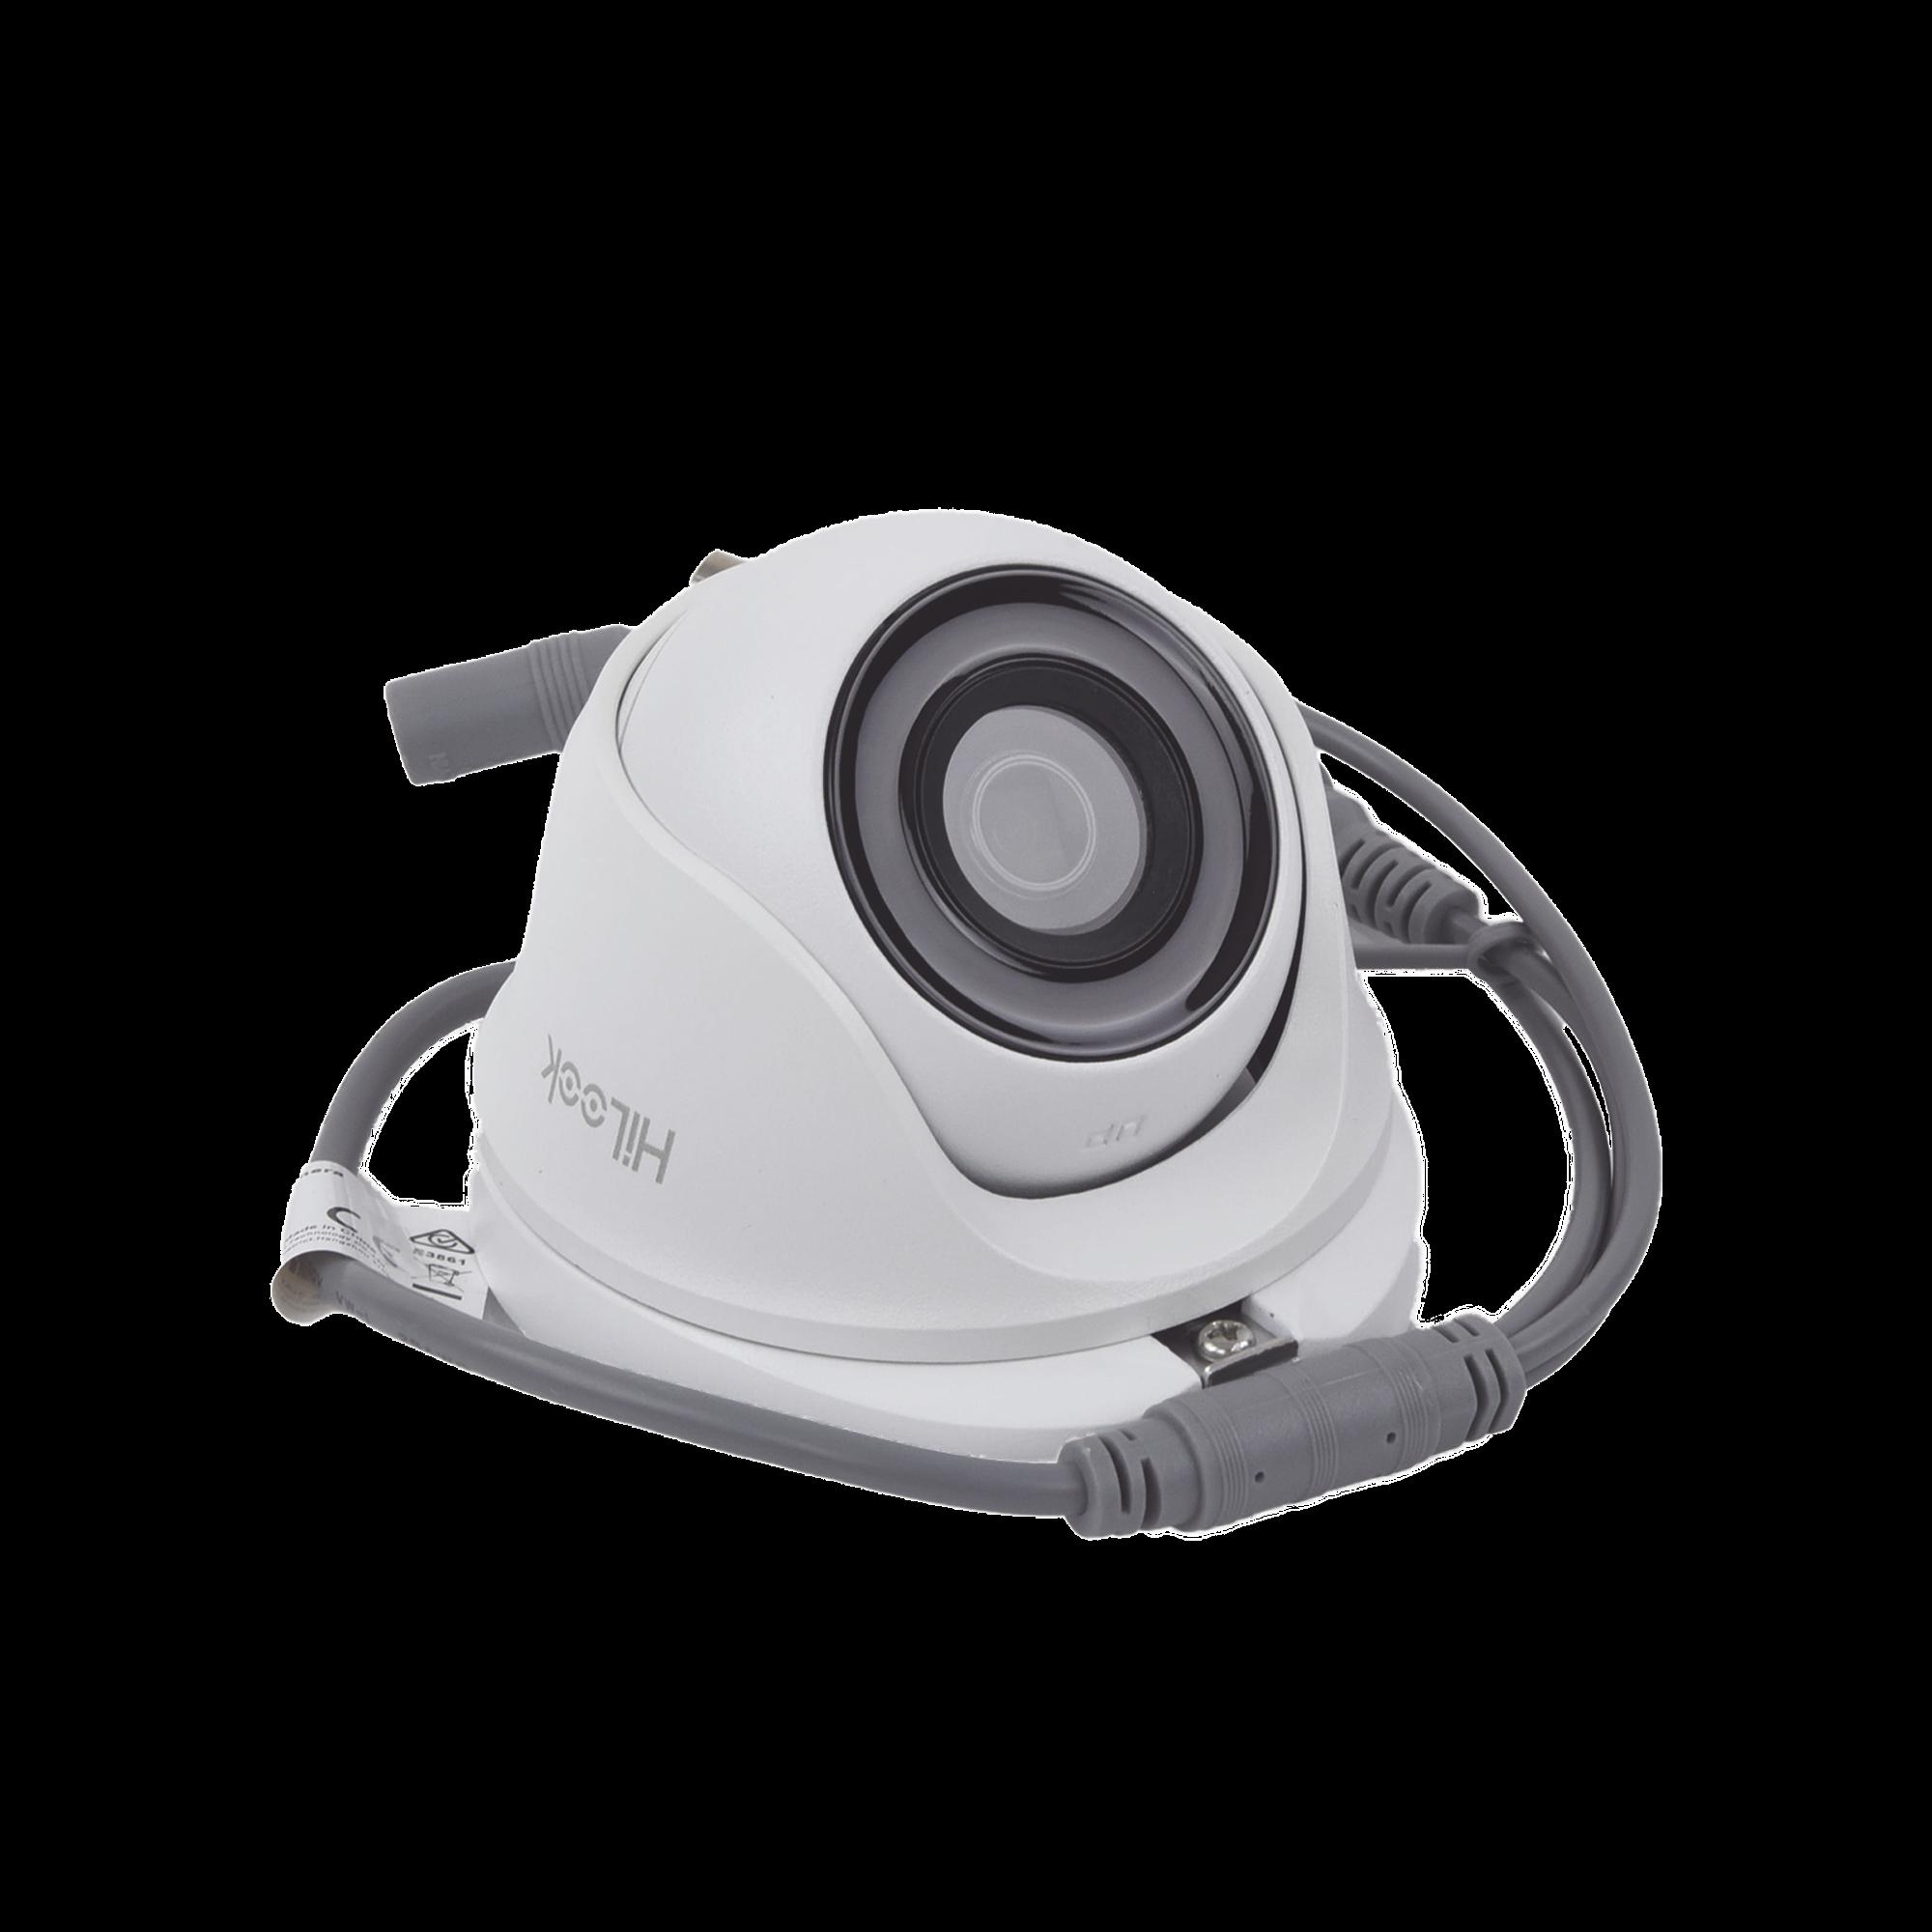 Turret TURBOHD 1080p / Lente 2.8 mm / 20 mts IR EXIR / 4 Tecnologías (TVI / AHD / CVI / CVBS) / IP66